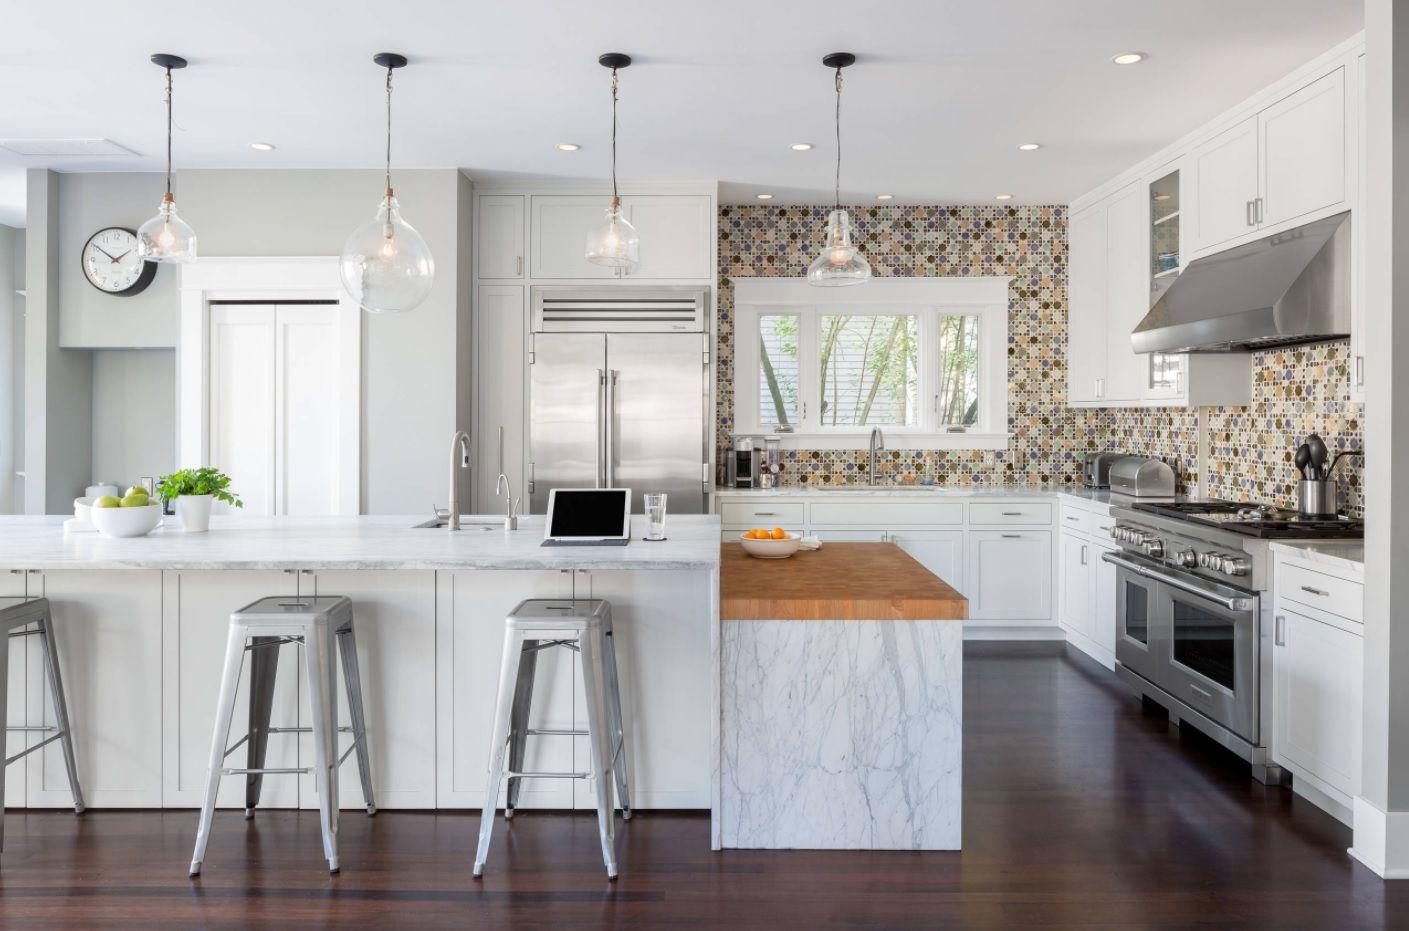 Butcher Block Countertop in Modern Kitchen Interior. Standing out mosaic tile for splashback